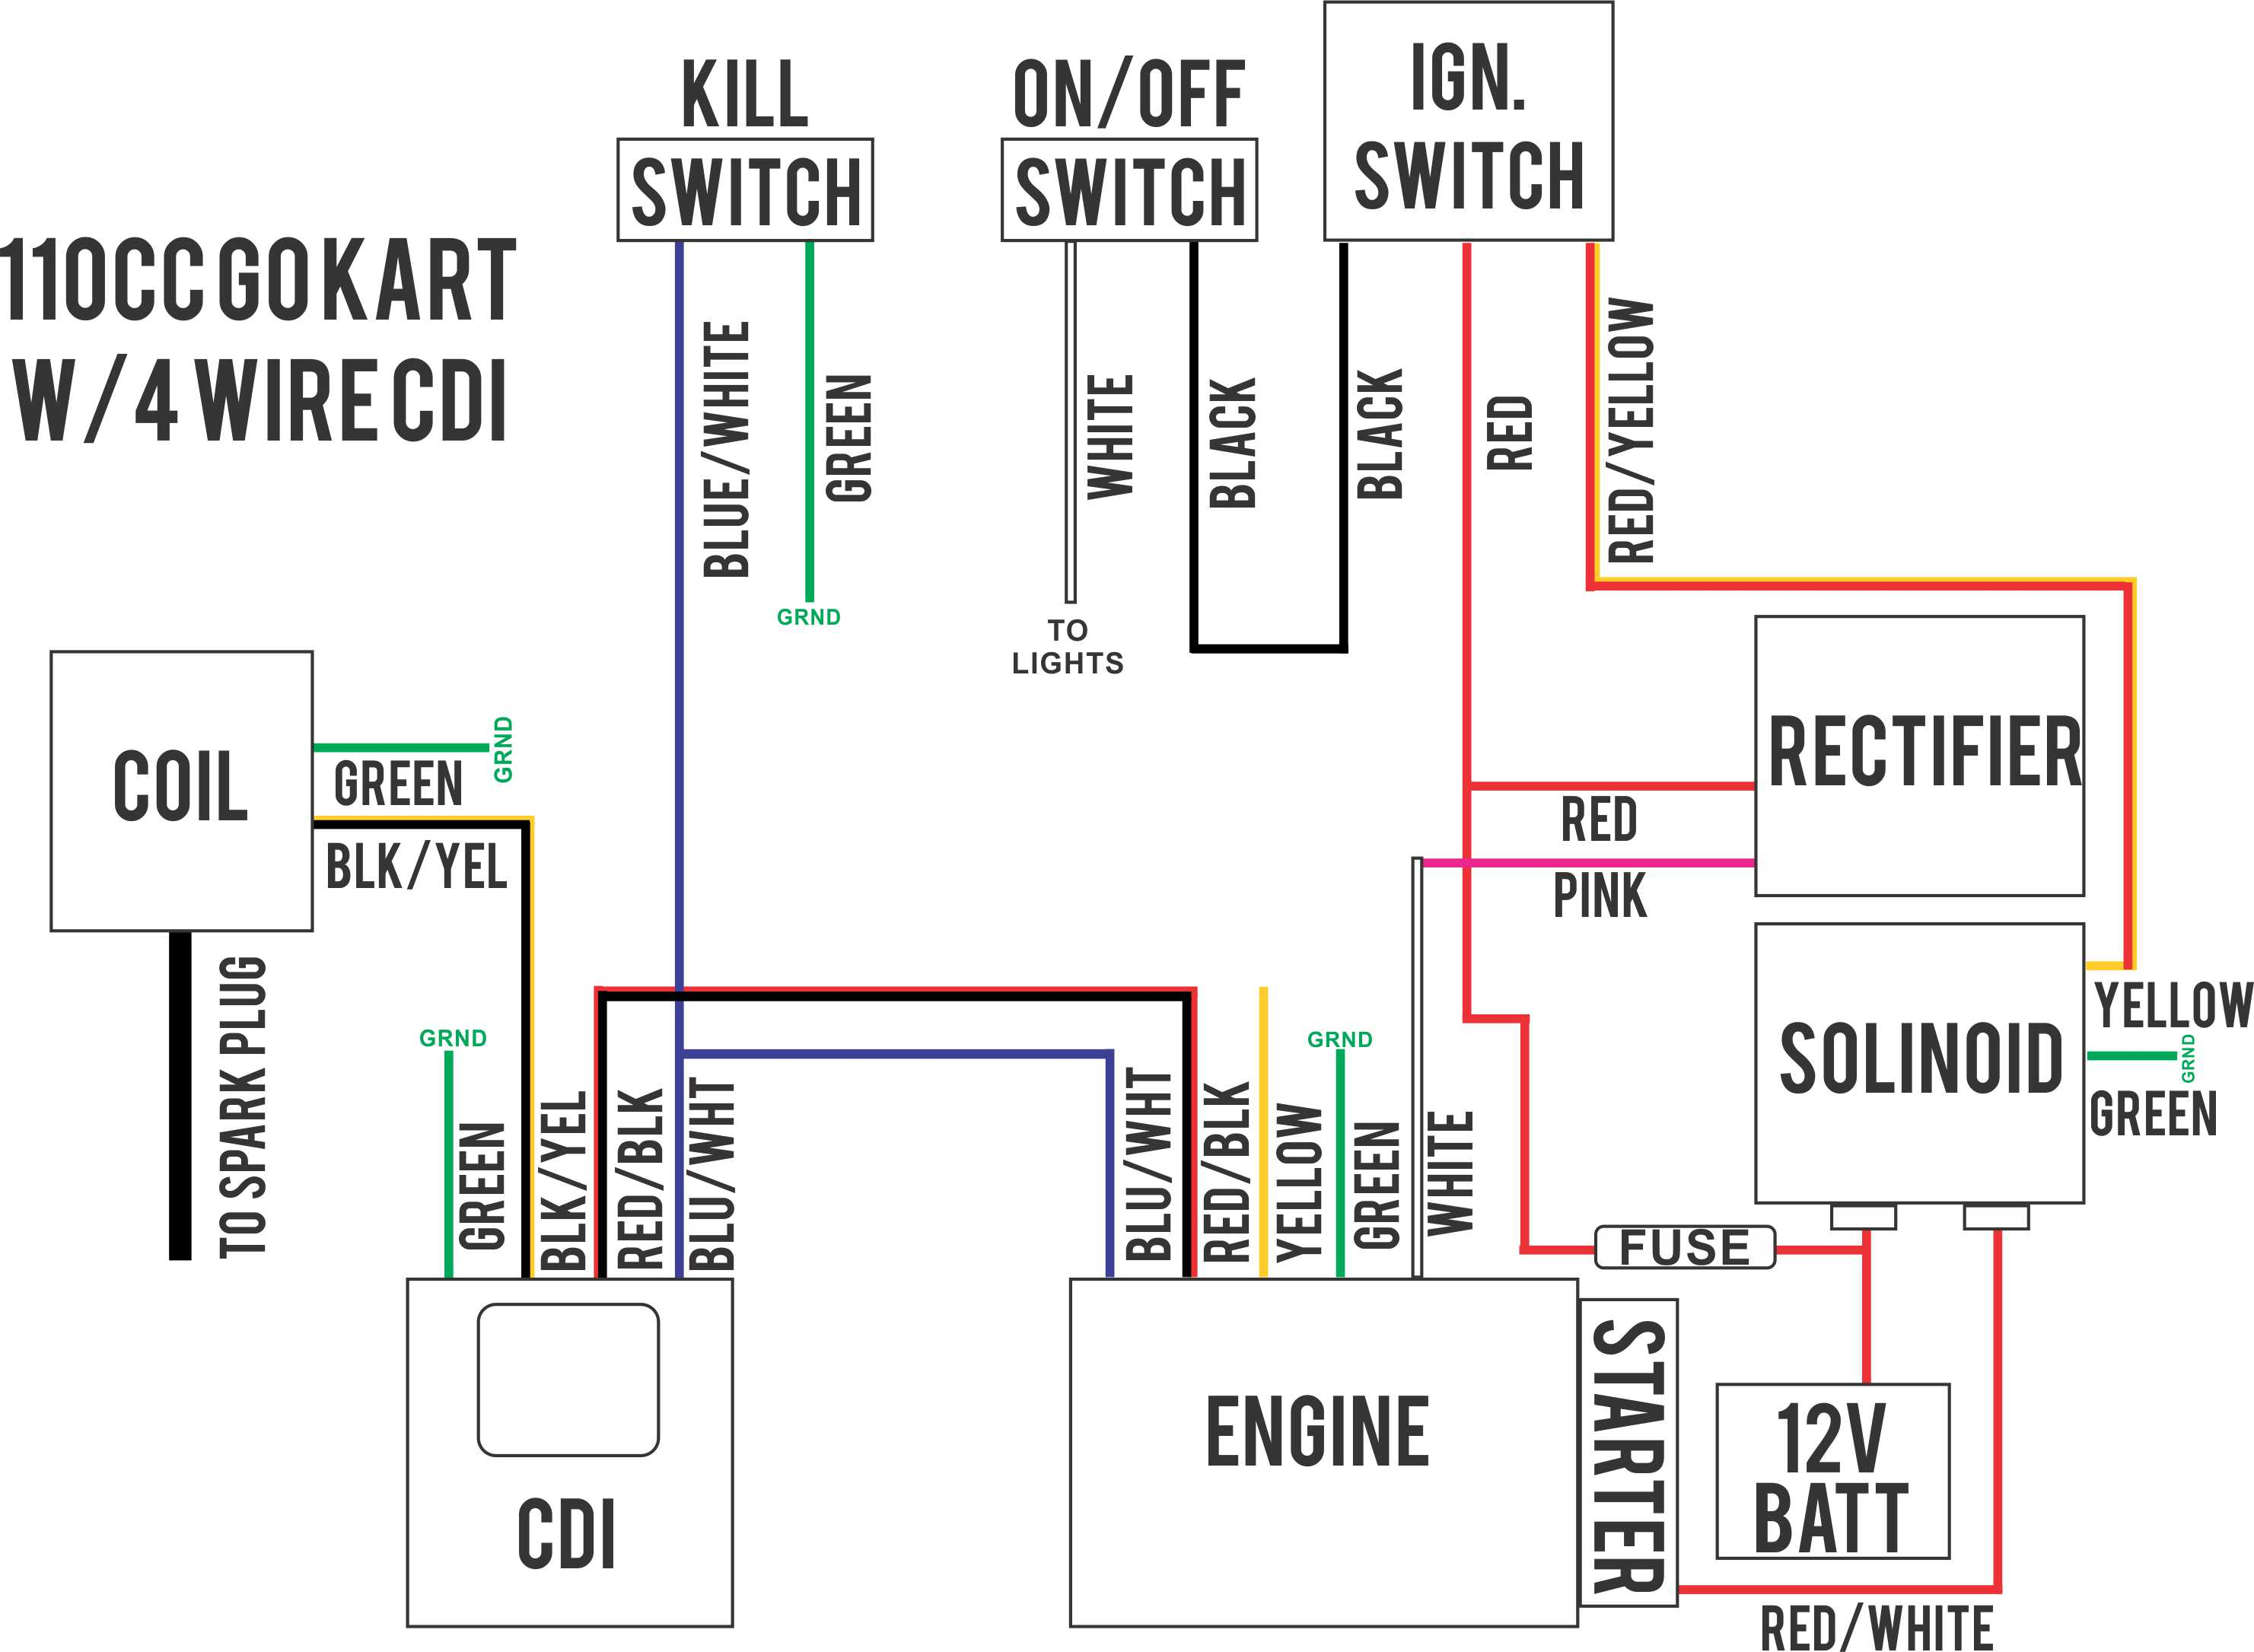 110Cc Chinese Atv Wiring Harness - Wiring Diagram Data - Chinese Atv Wiring Diagram 110